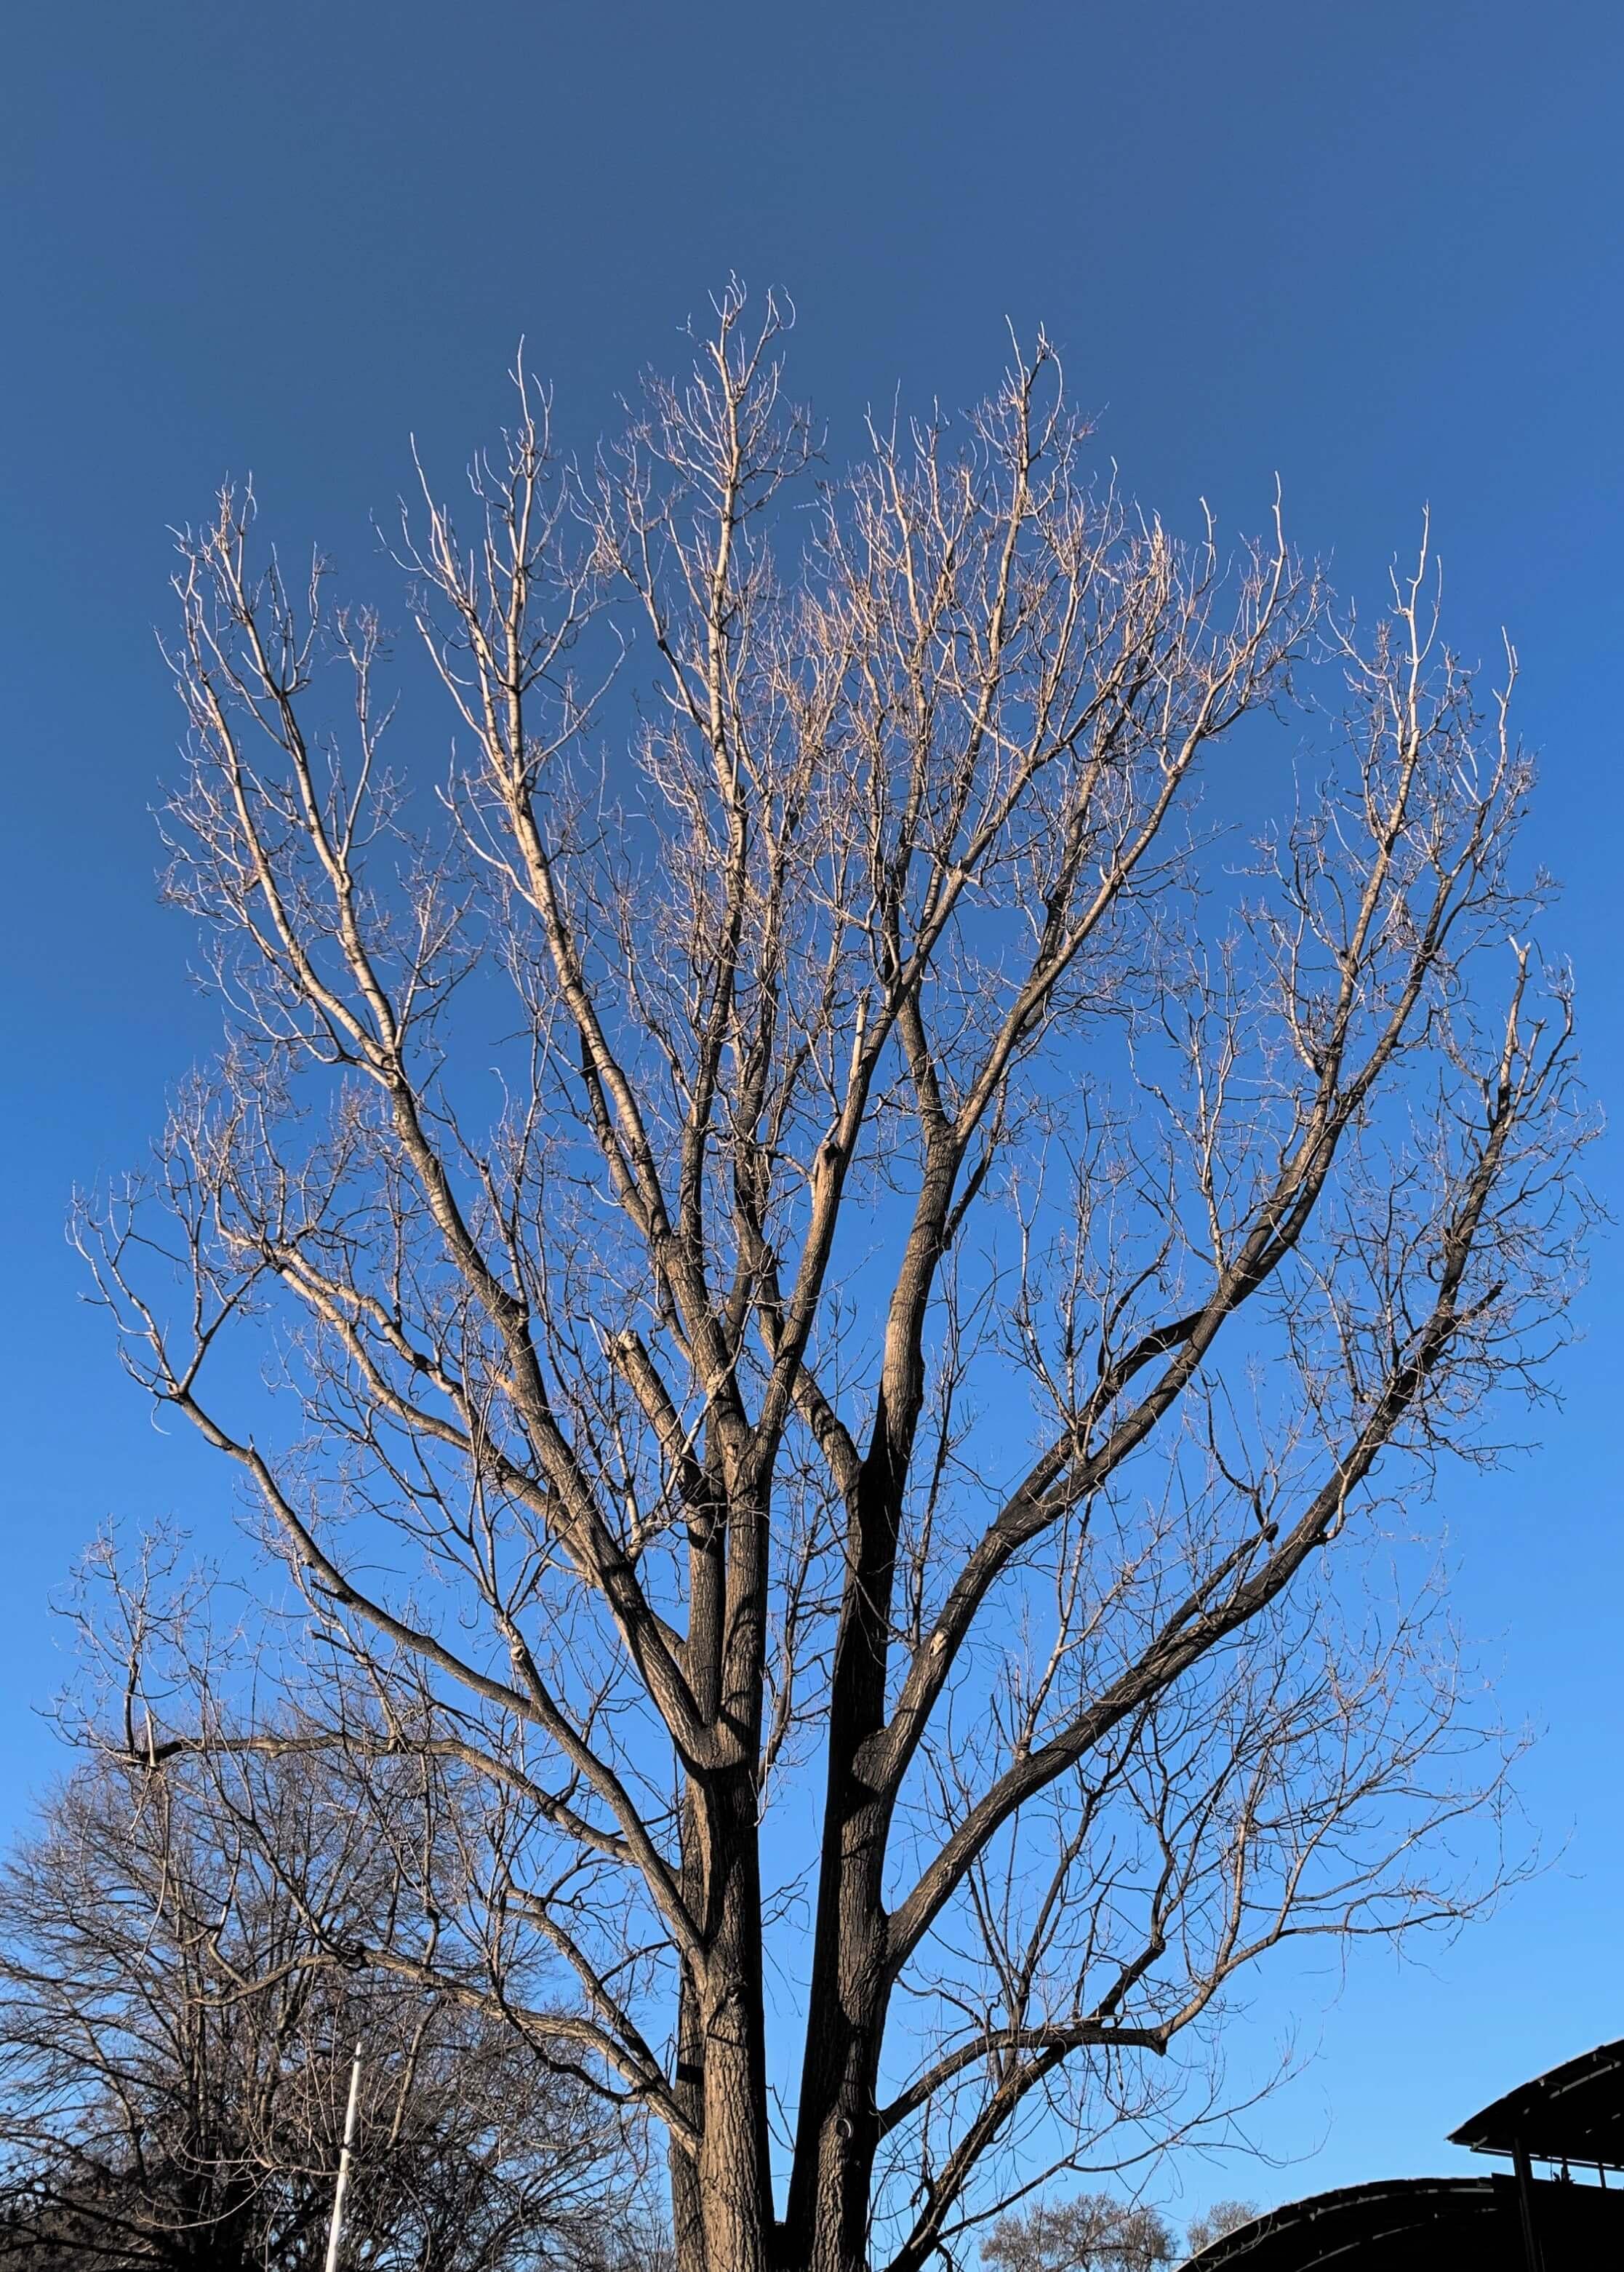 photo of a leafless tree's limbs